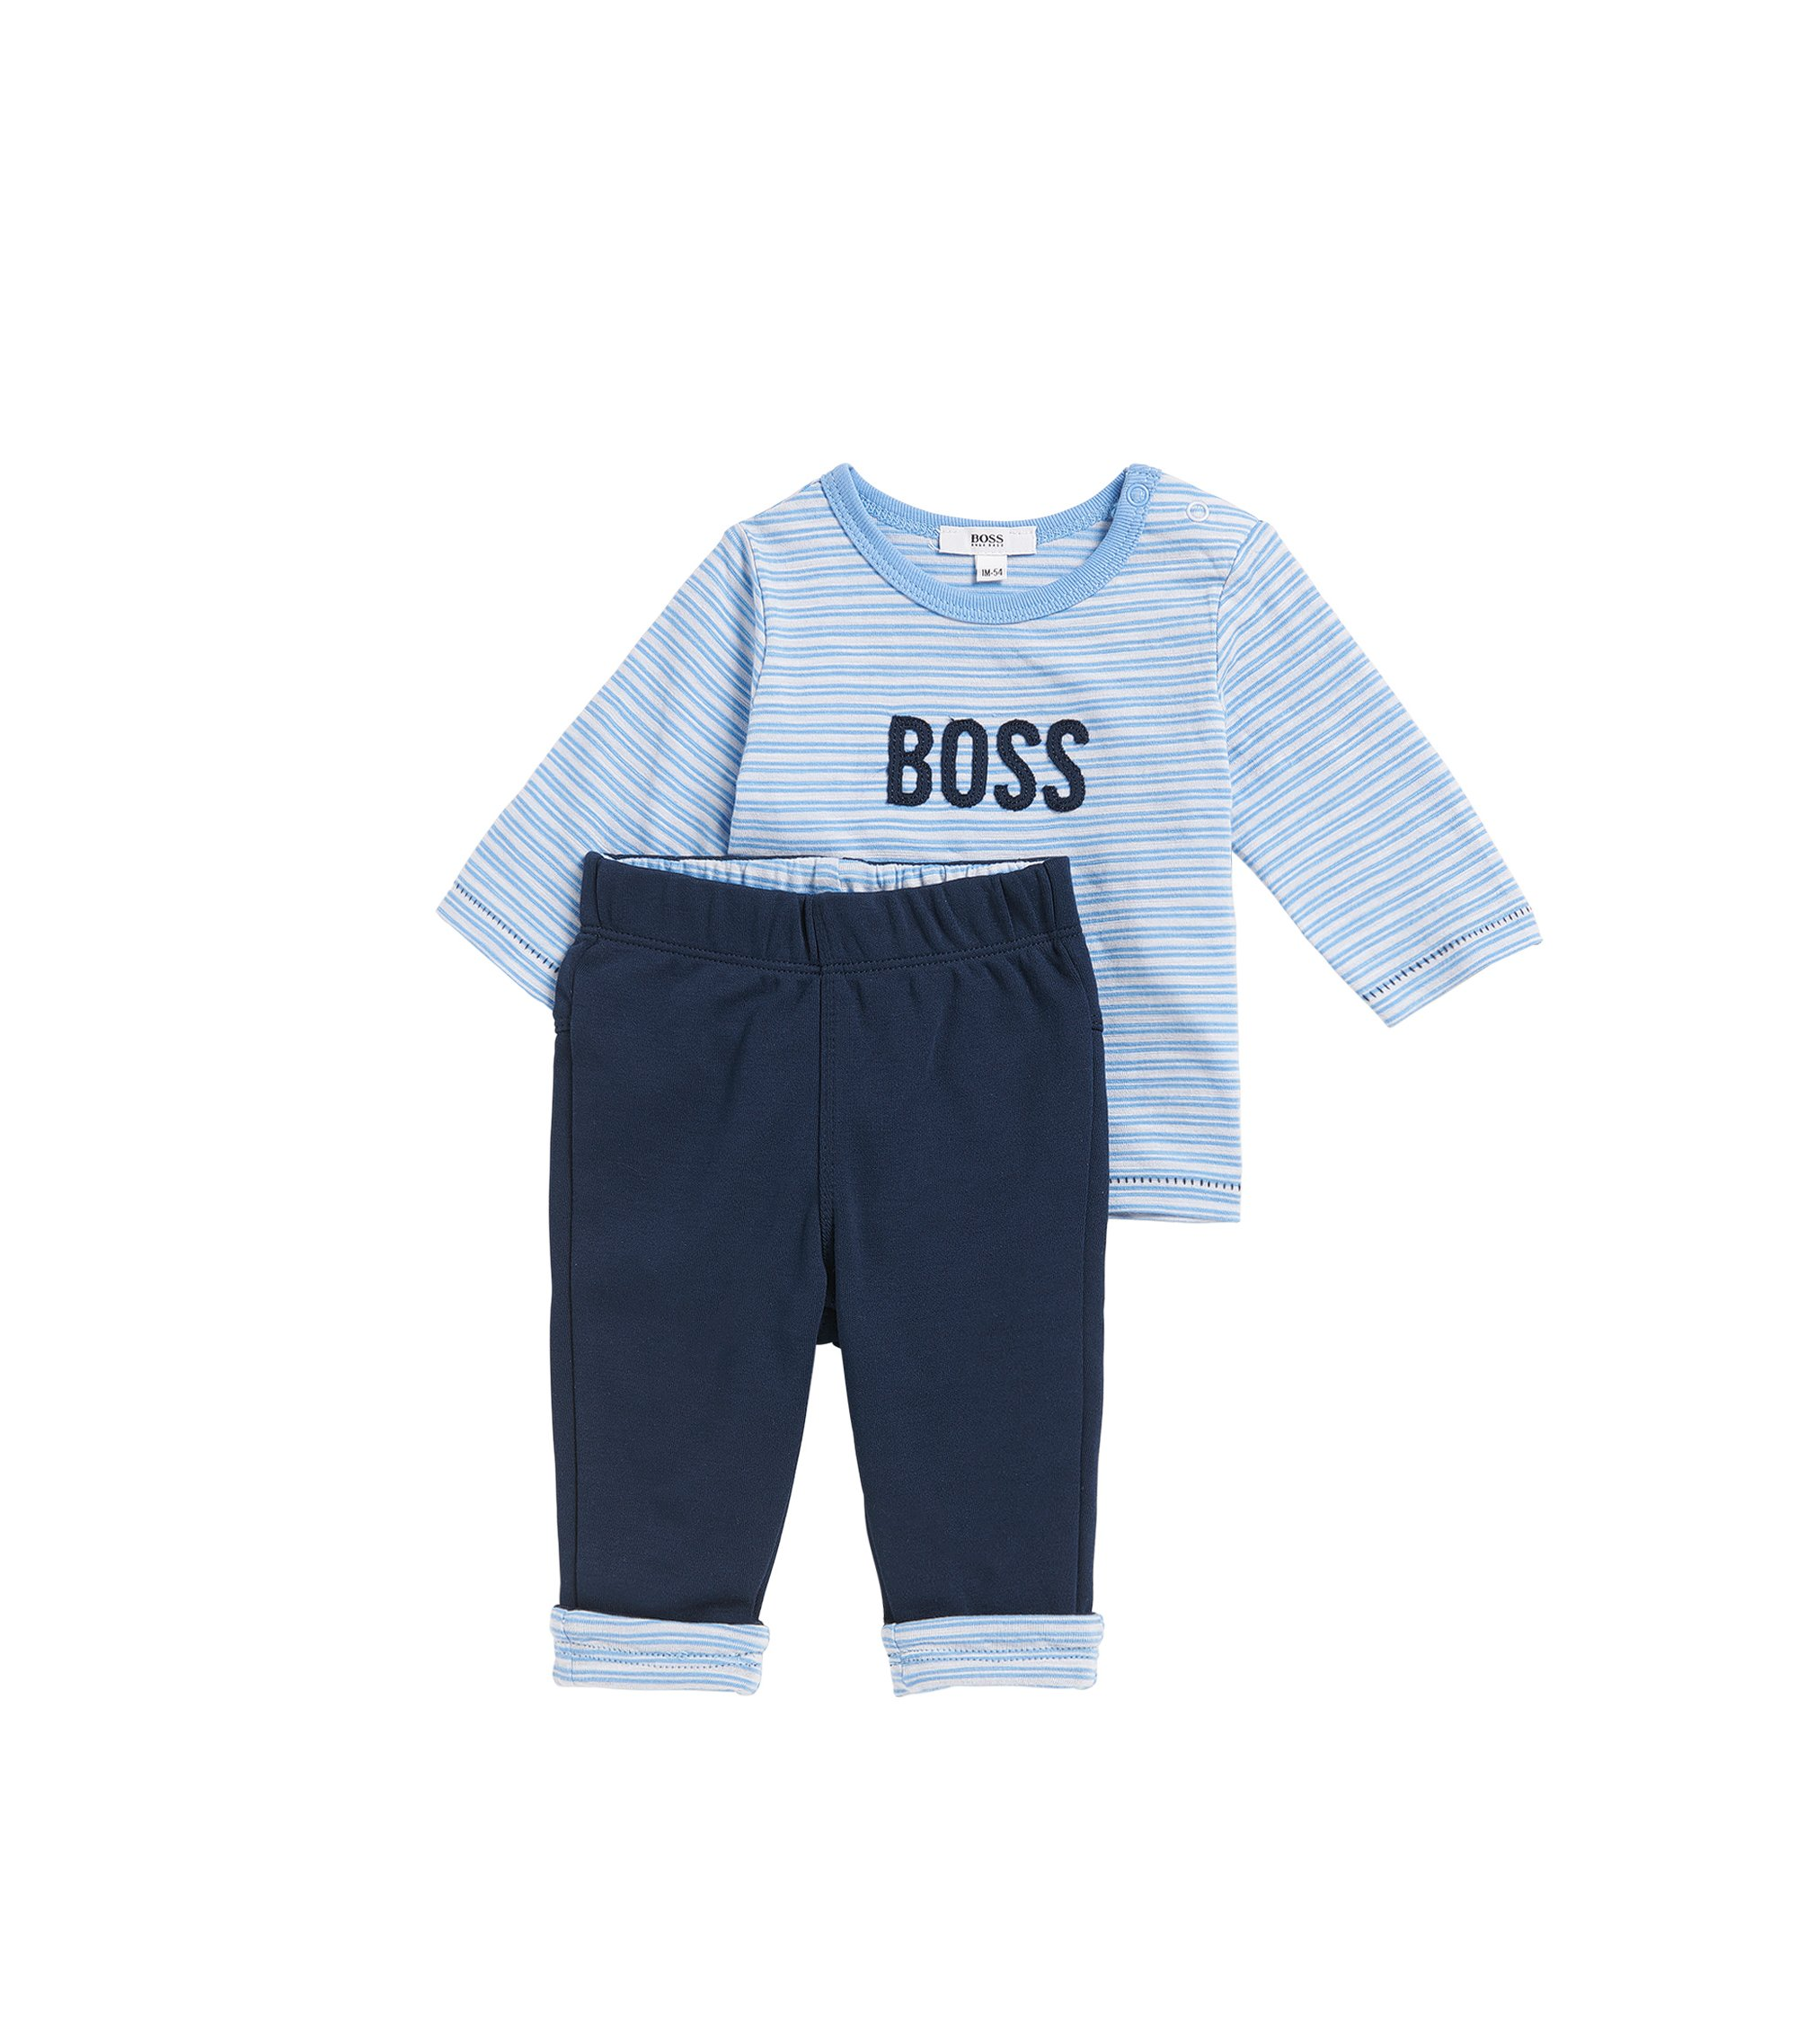 Baby Set mit Regular-Fit Longsleeve und Hose aus Baumwolle, Hellblau